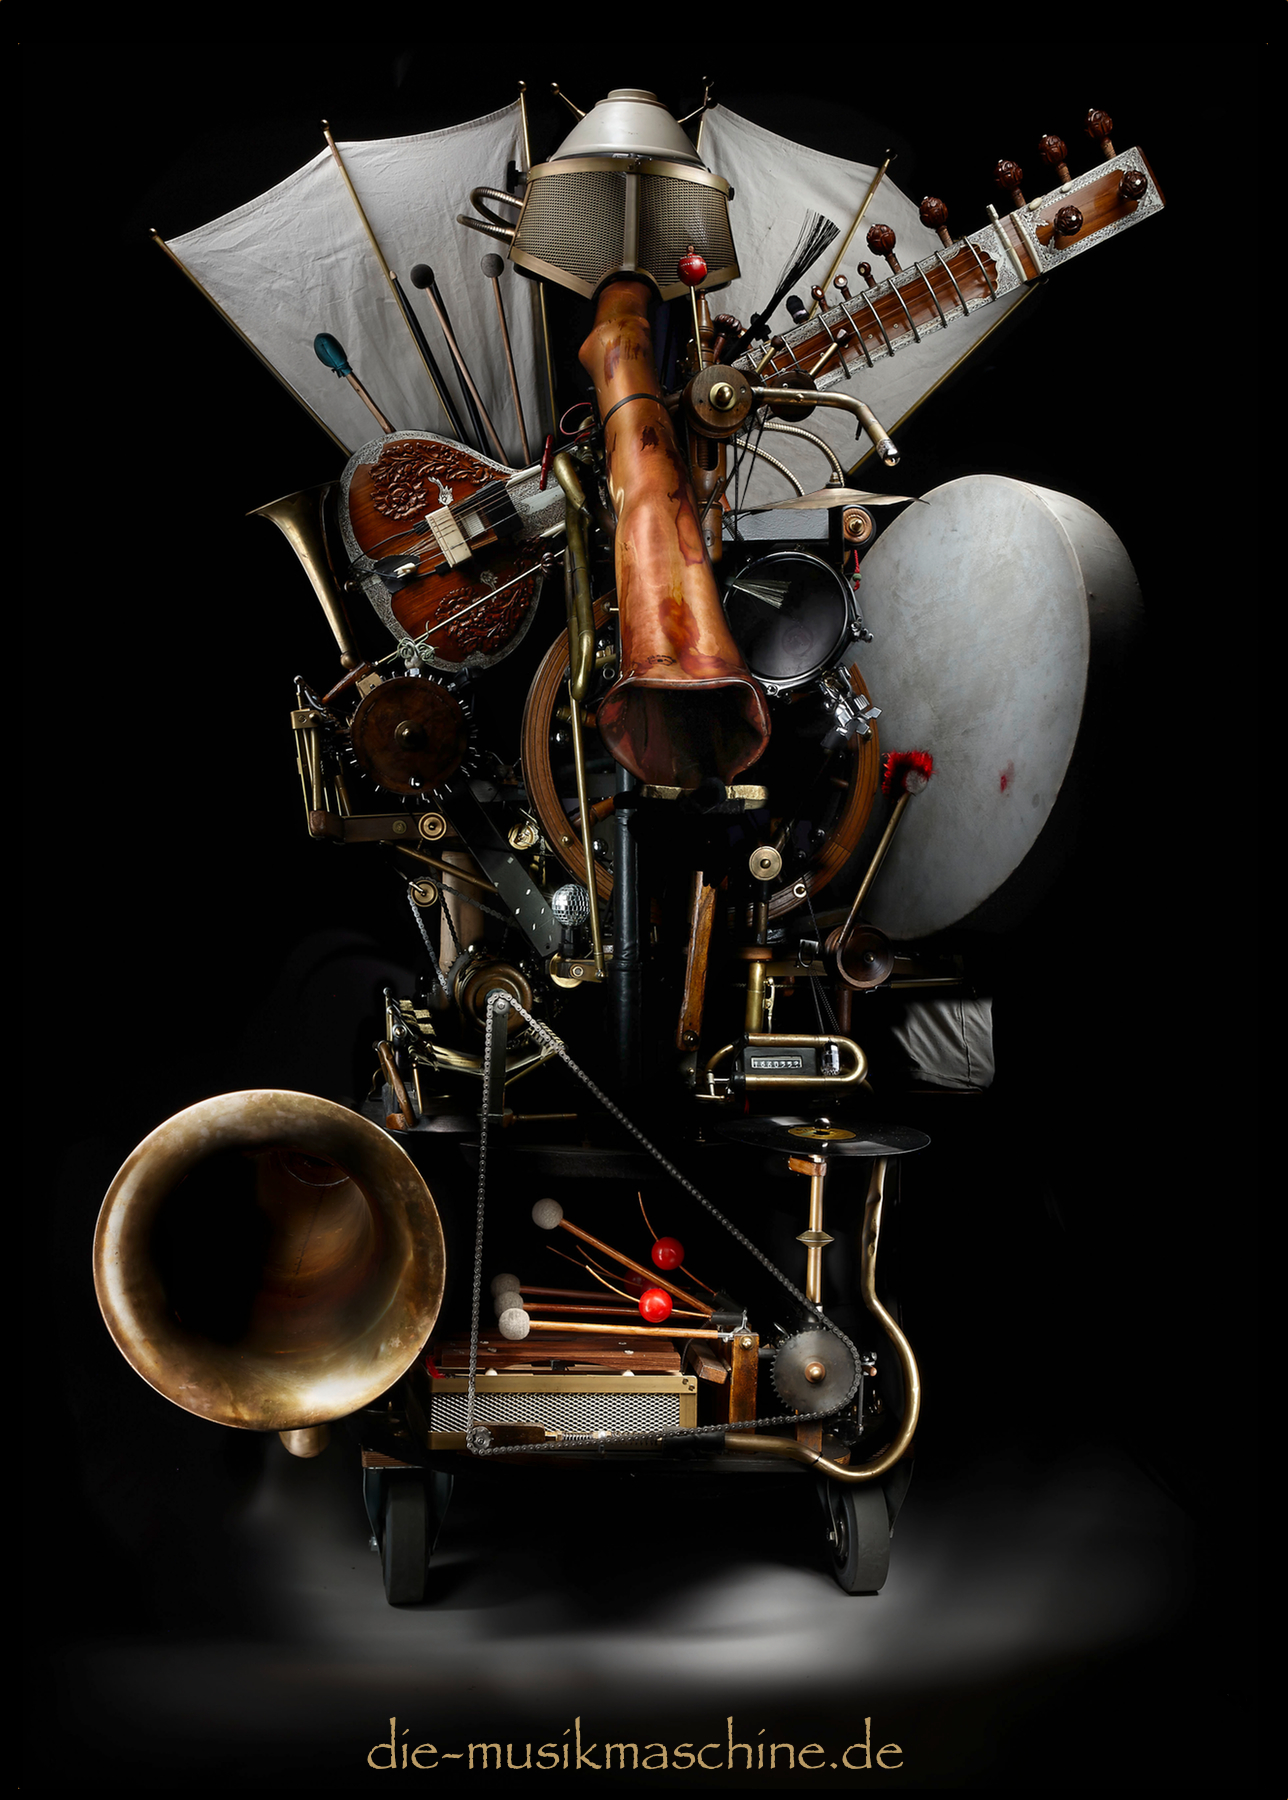 Postkarte GöG Die Musikmaschine